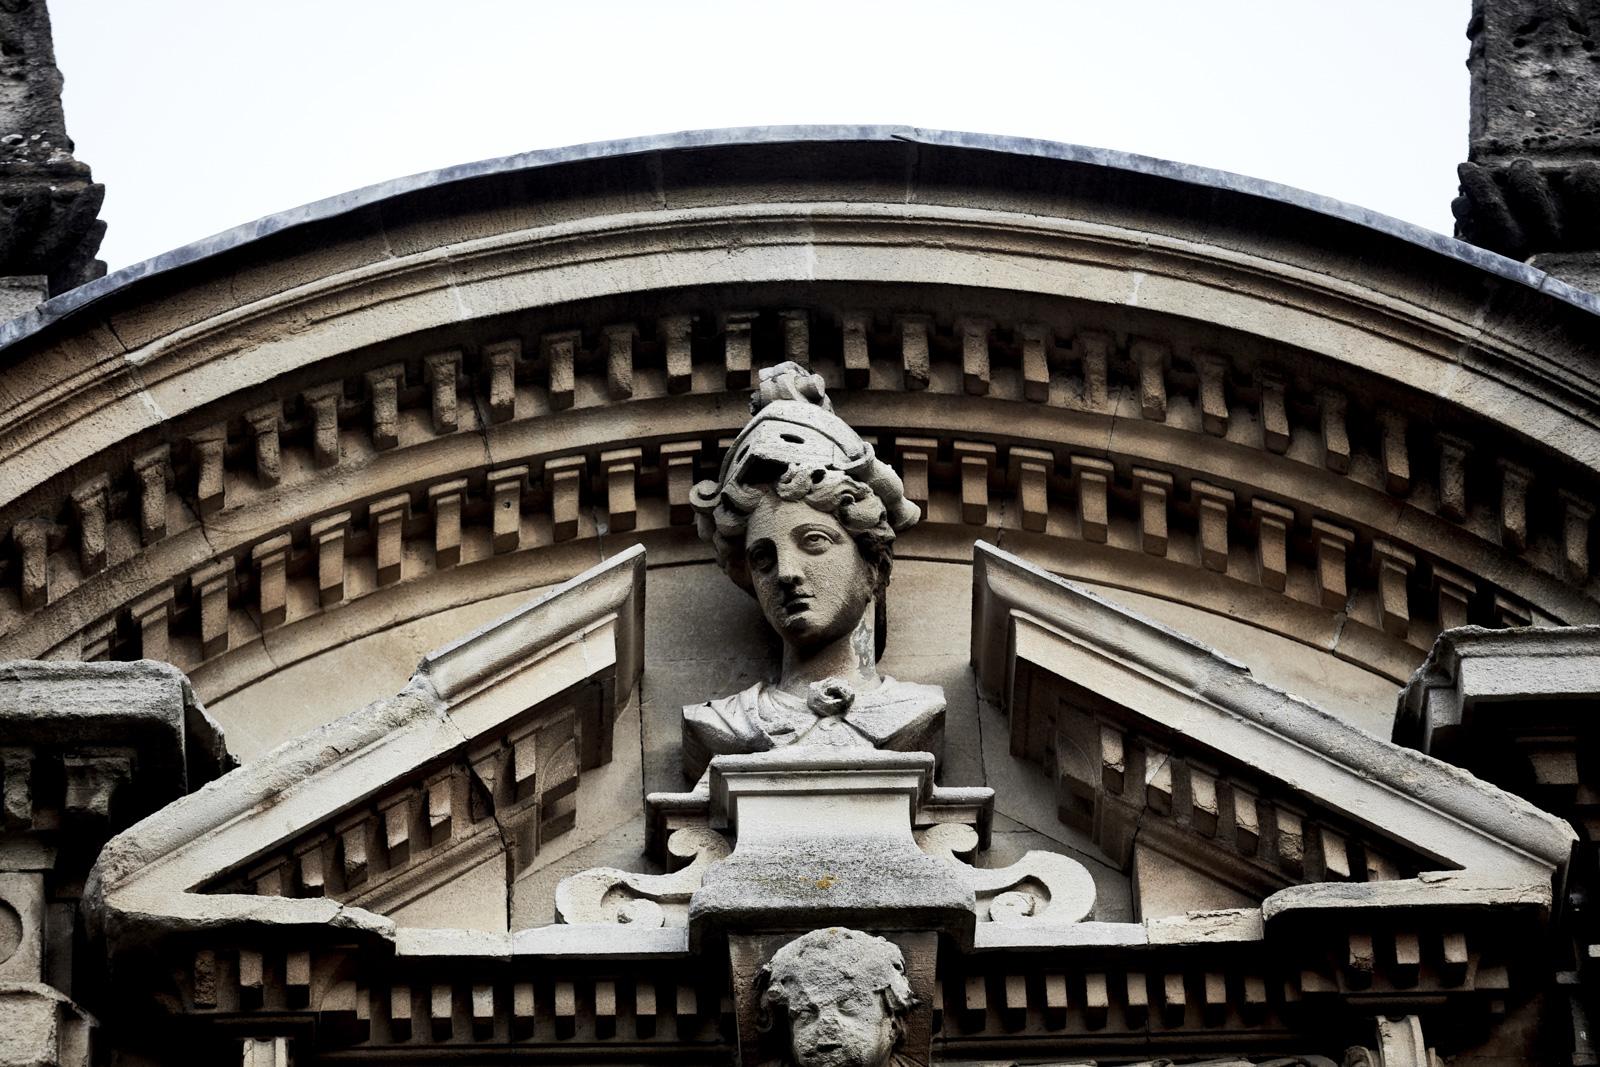 OLIVER_EDWARDS_BATH_ARCHITECTURE_015.jpg